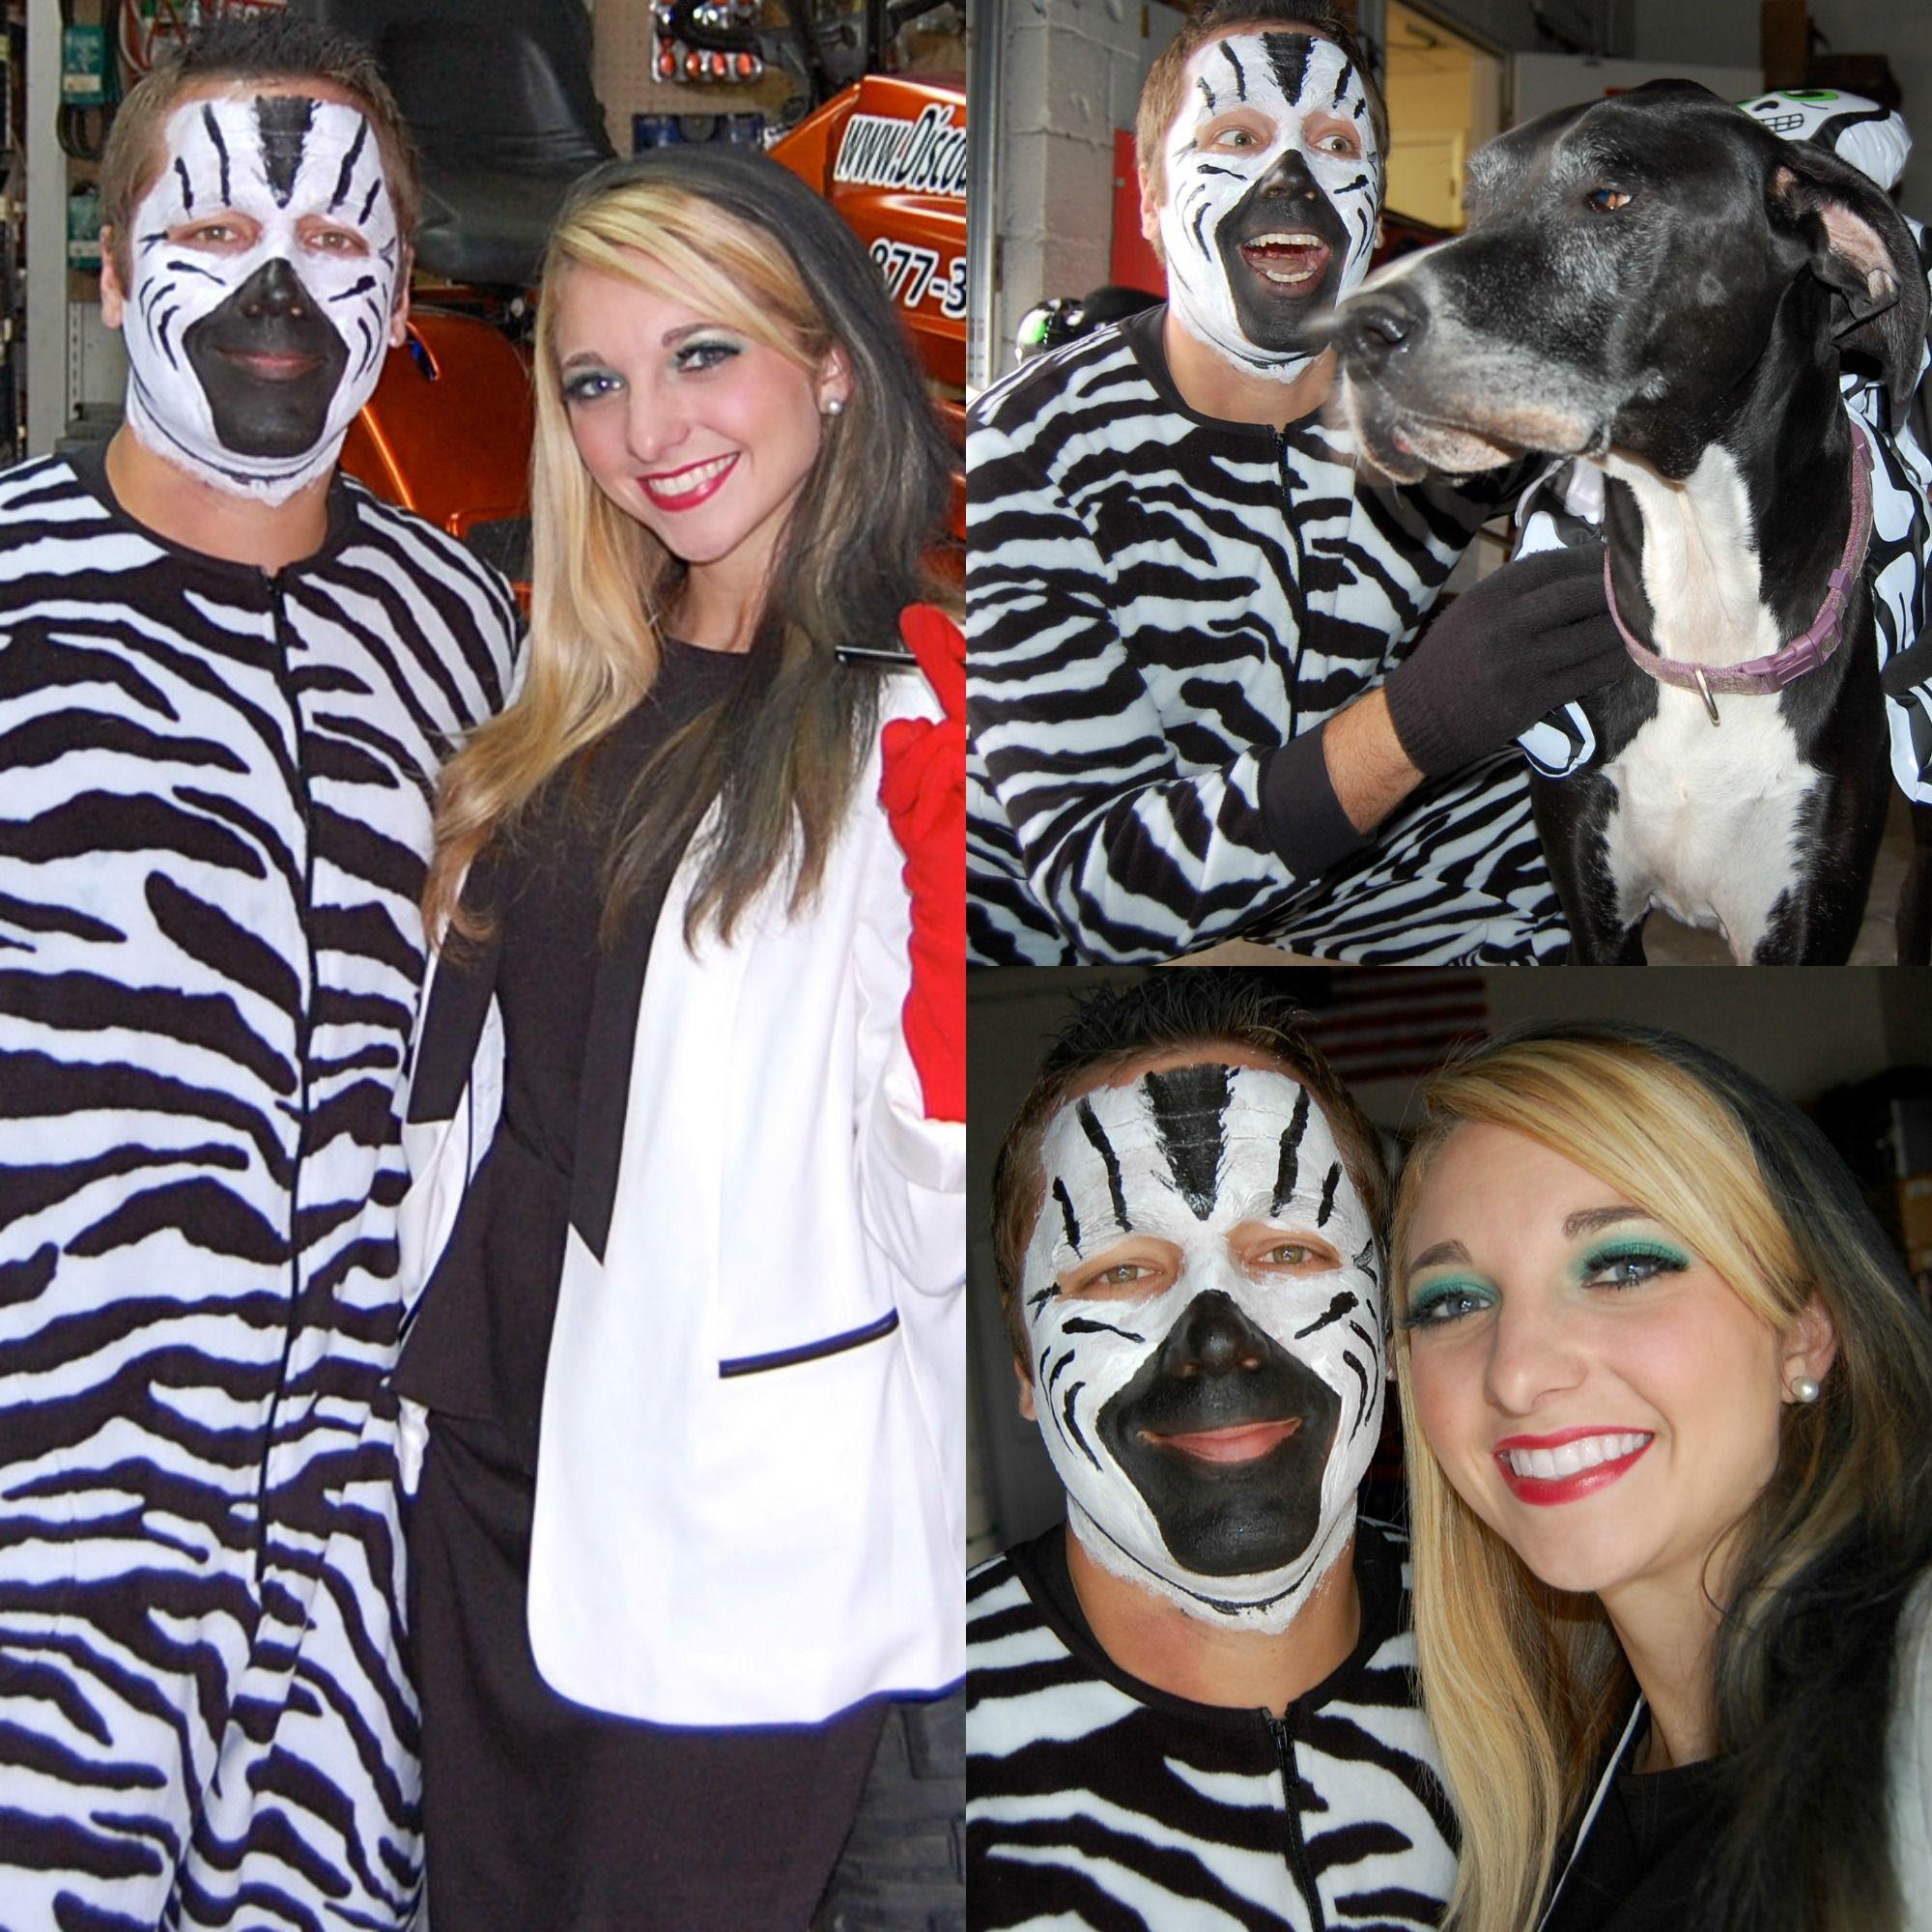 Halloween 2013. Zebra and Cruella Deville